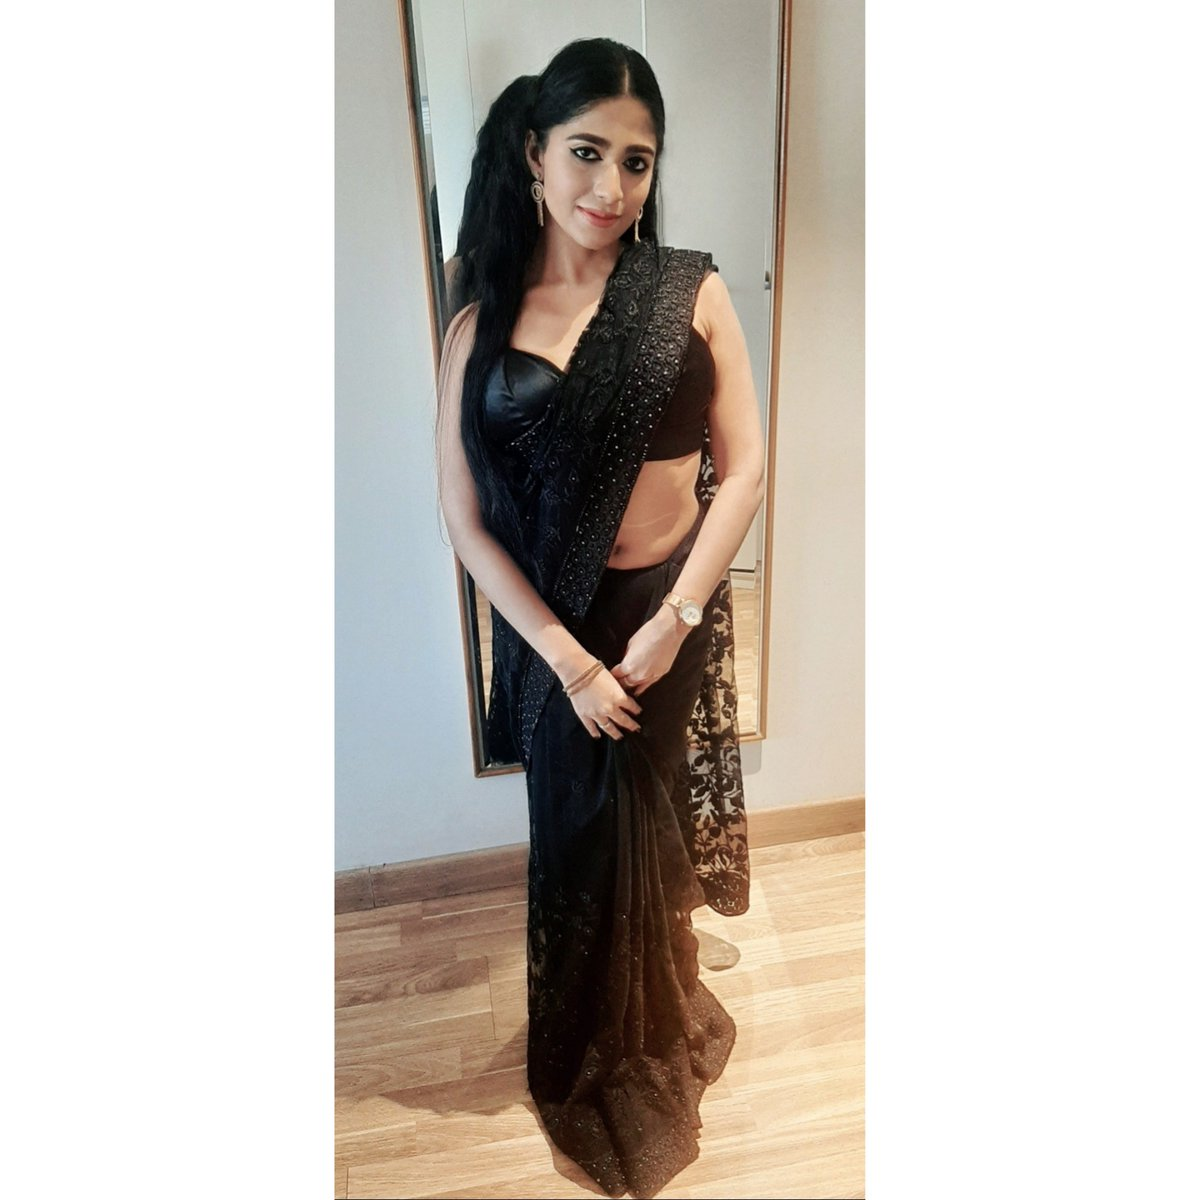 When in doubt, wear a saree and feel sexy! 💋🔥  Deepawali 2k20 ❤💫🥰  #kalipujo #diwali2020 #diwalivibes #diwalioutfit #diwalivibes #diwalispecial #happydiwali #instablogger #beautybloggers #makeupblogger #indianblogger #kolkatablogger #makeupjunkie #blacksaree #sëxy #sexysaree